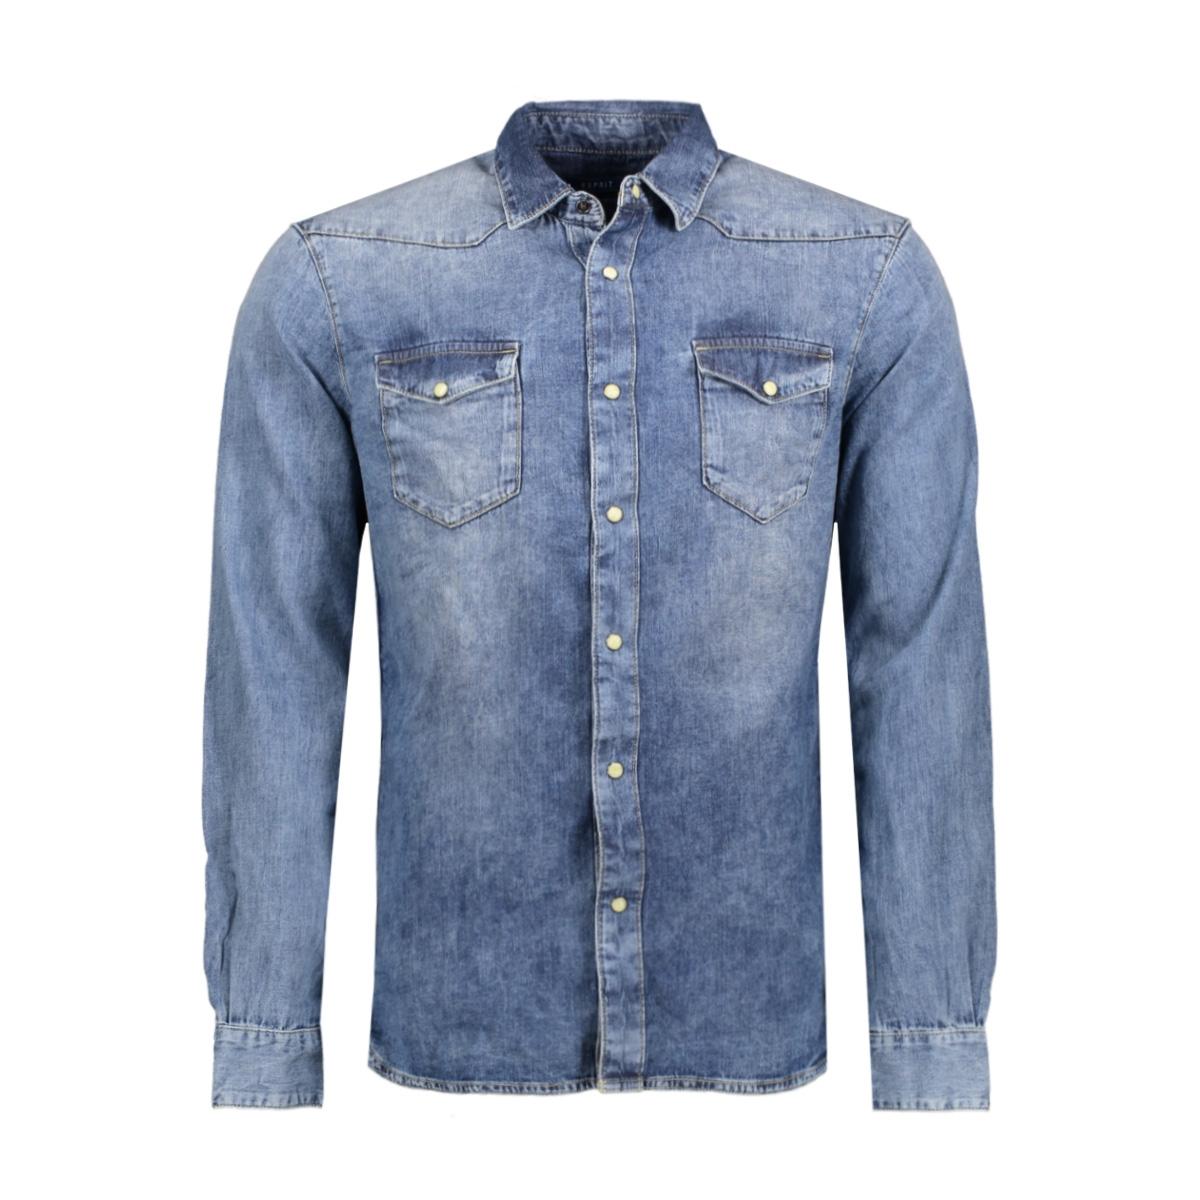 087ee2f018 esprit overhemd e902